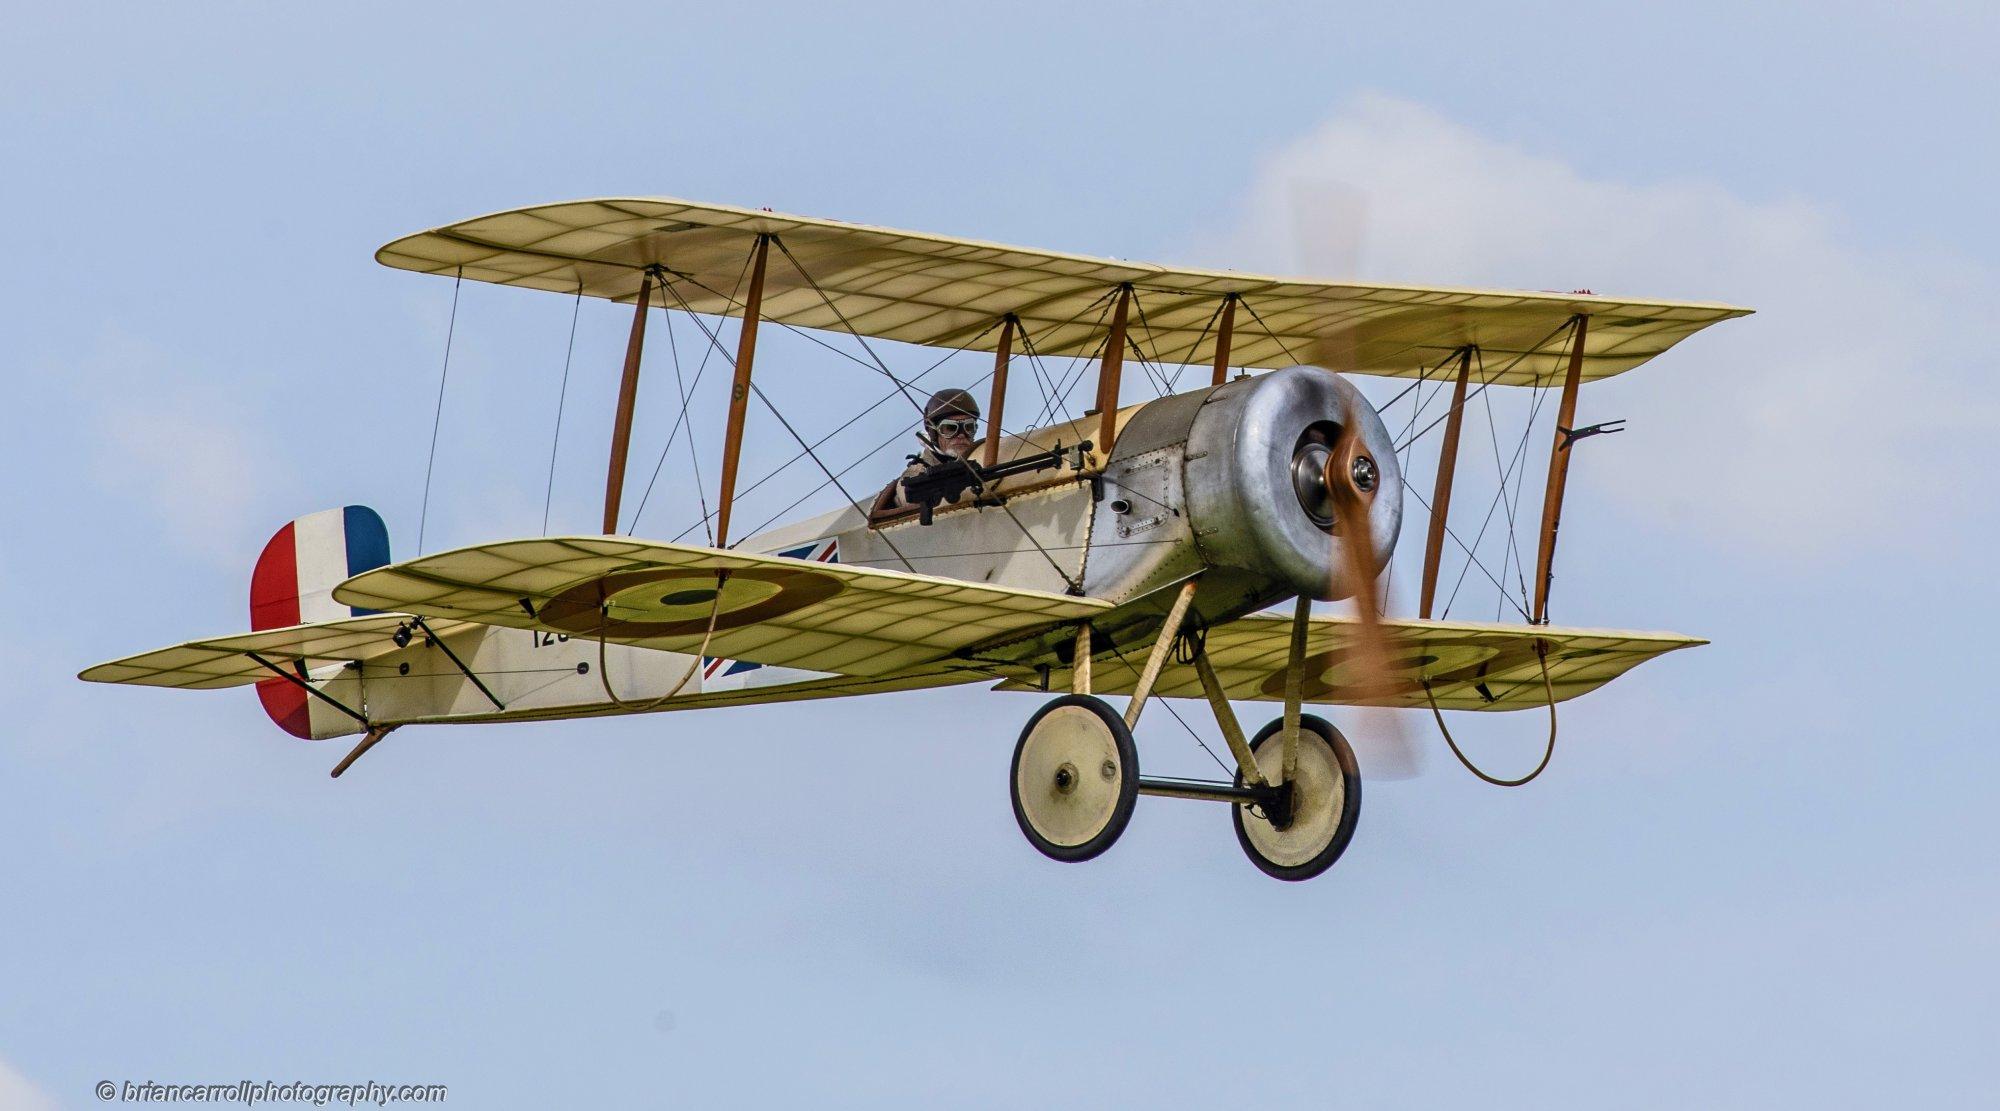 1913 Bristol Scout biplane